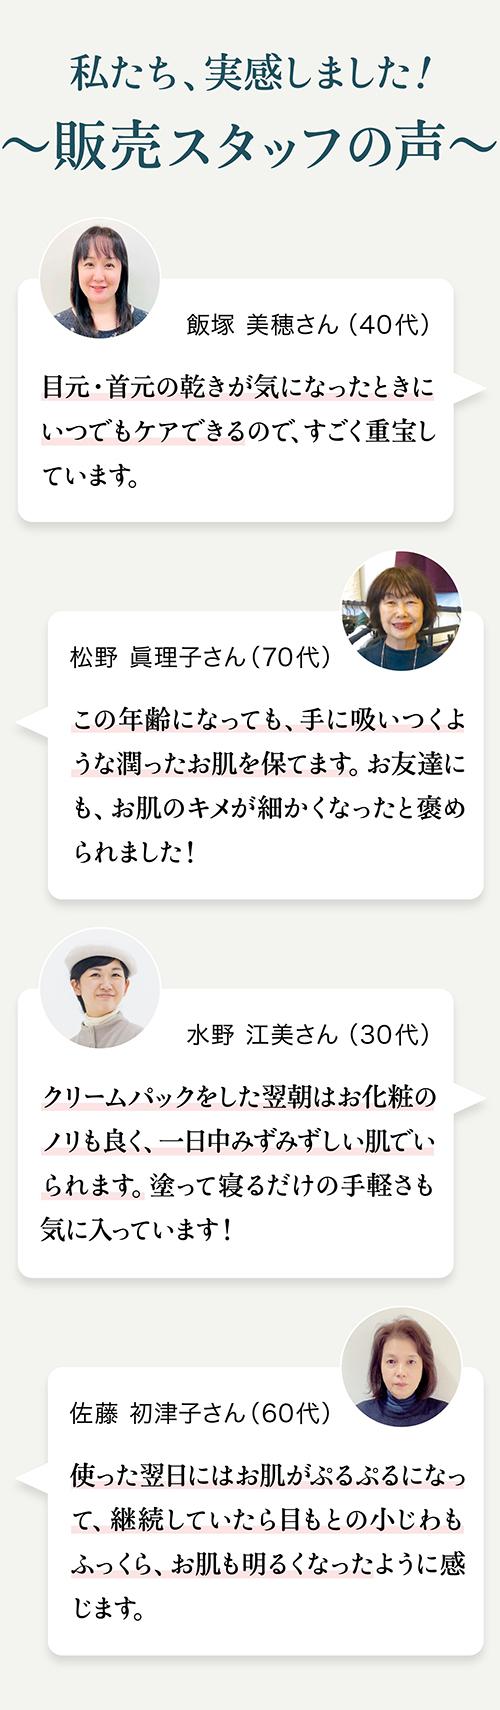 MeDu_store_online_w500_specialcare_08.jpg